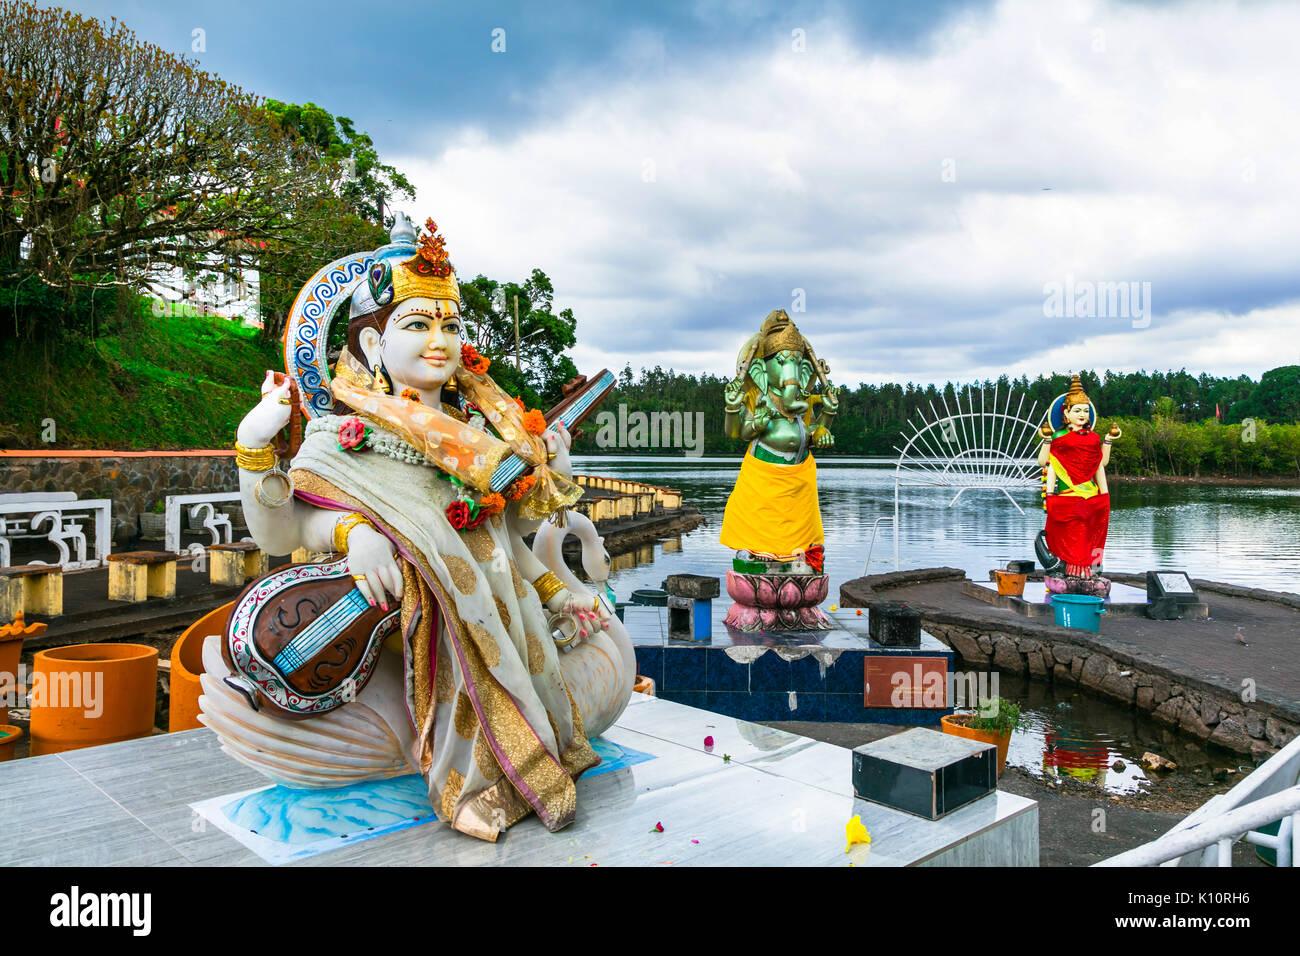 Landmarks of Mauritius - Grand bassin hindu temple on the lakeside - Stock Image